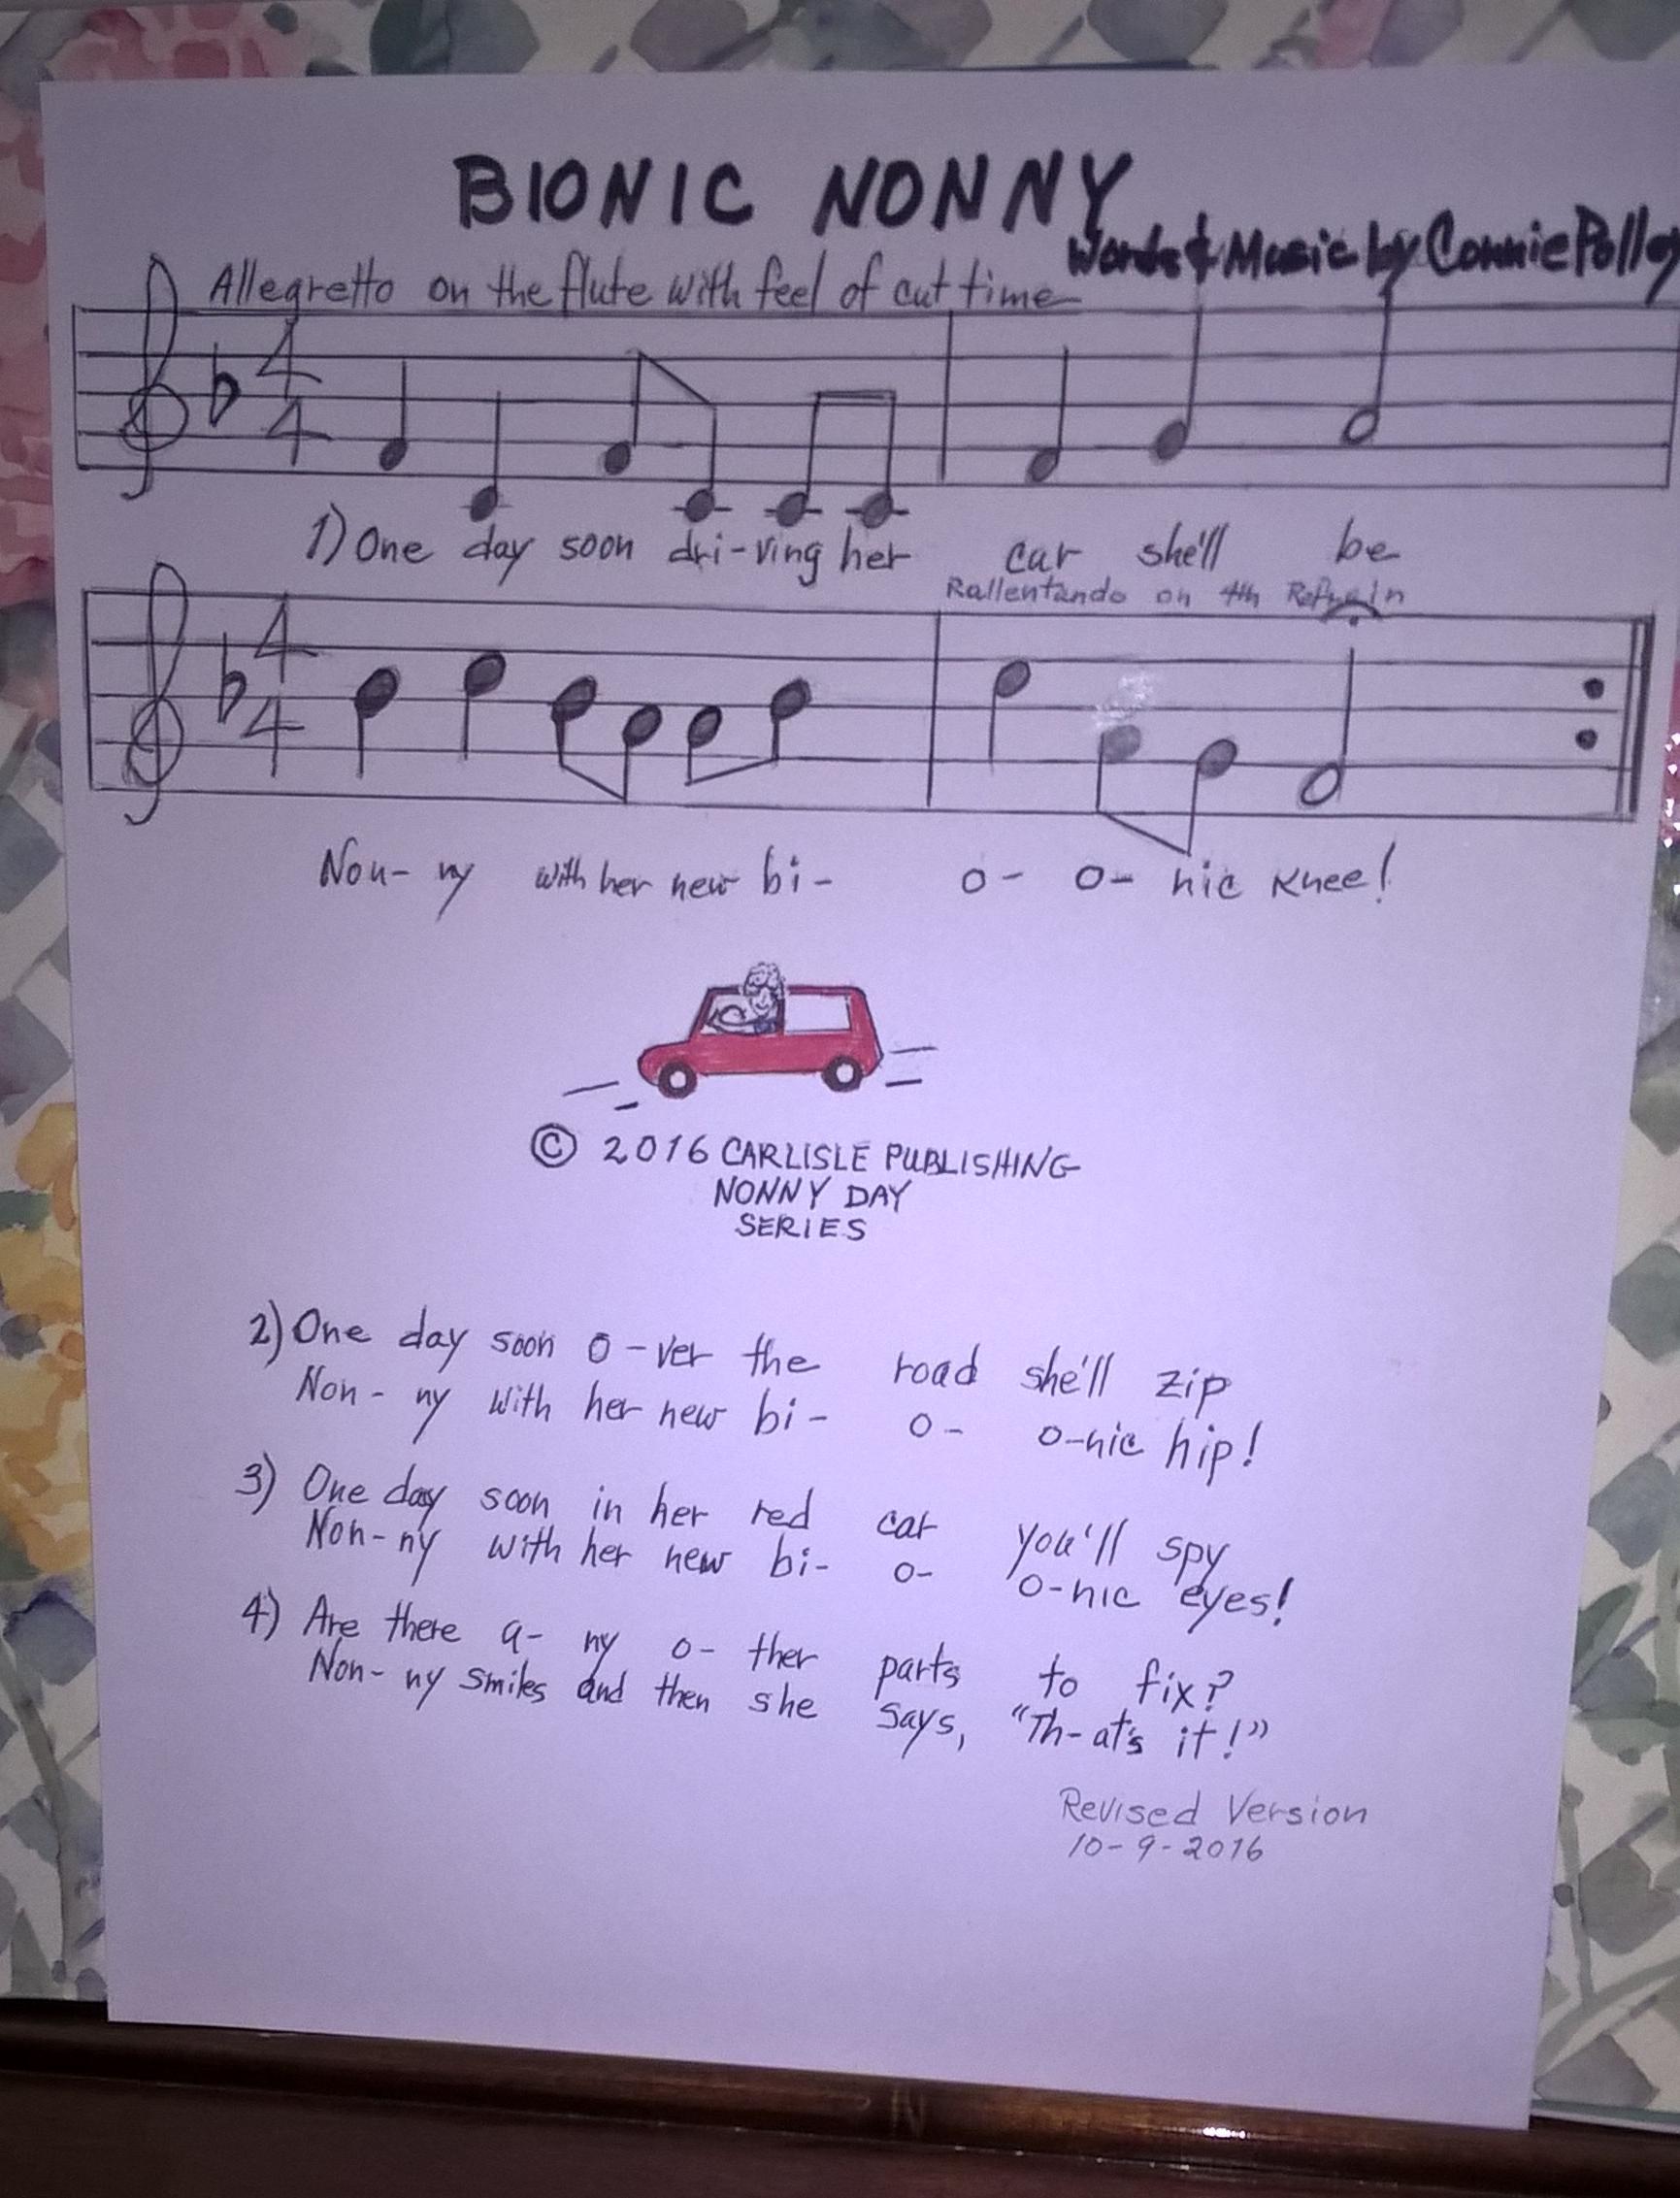 Bionic Nonny handwritten sheet music